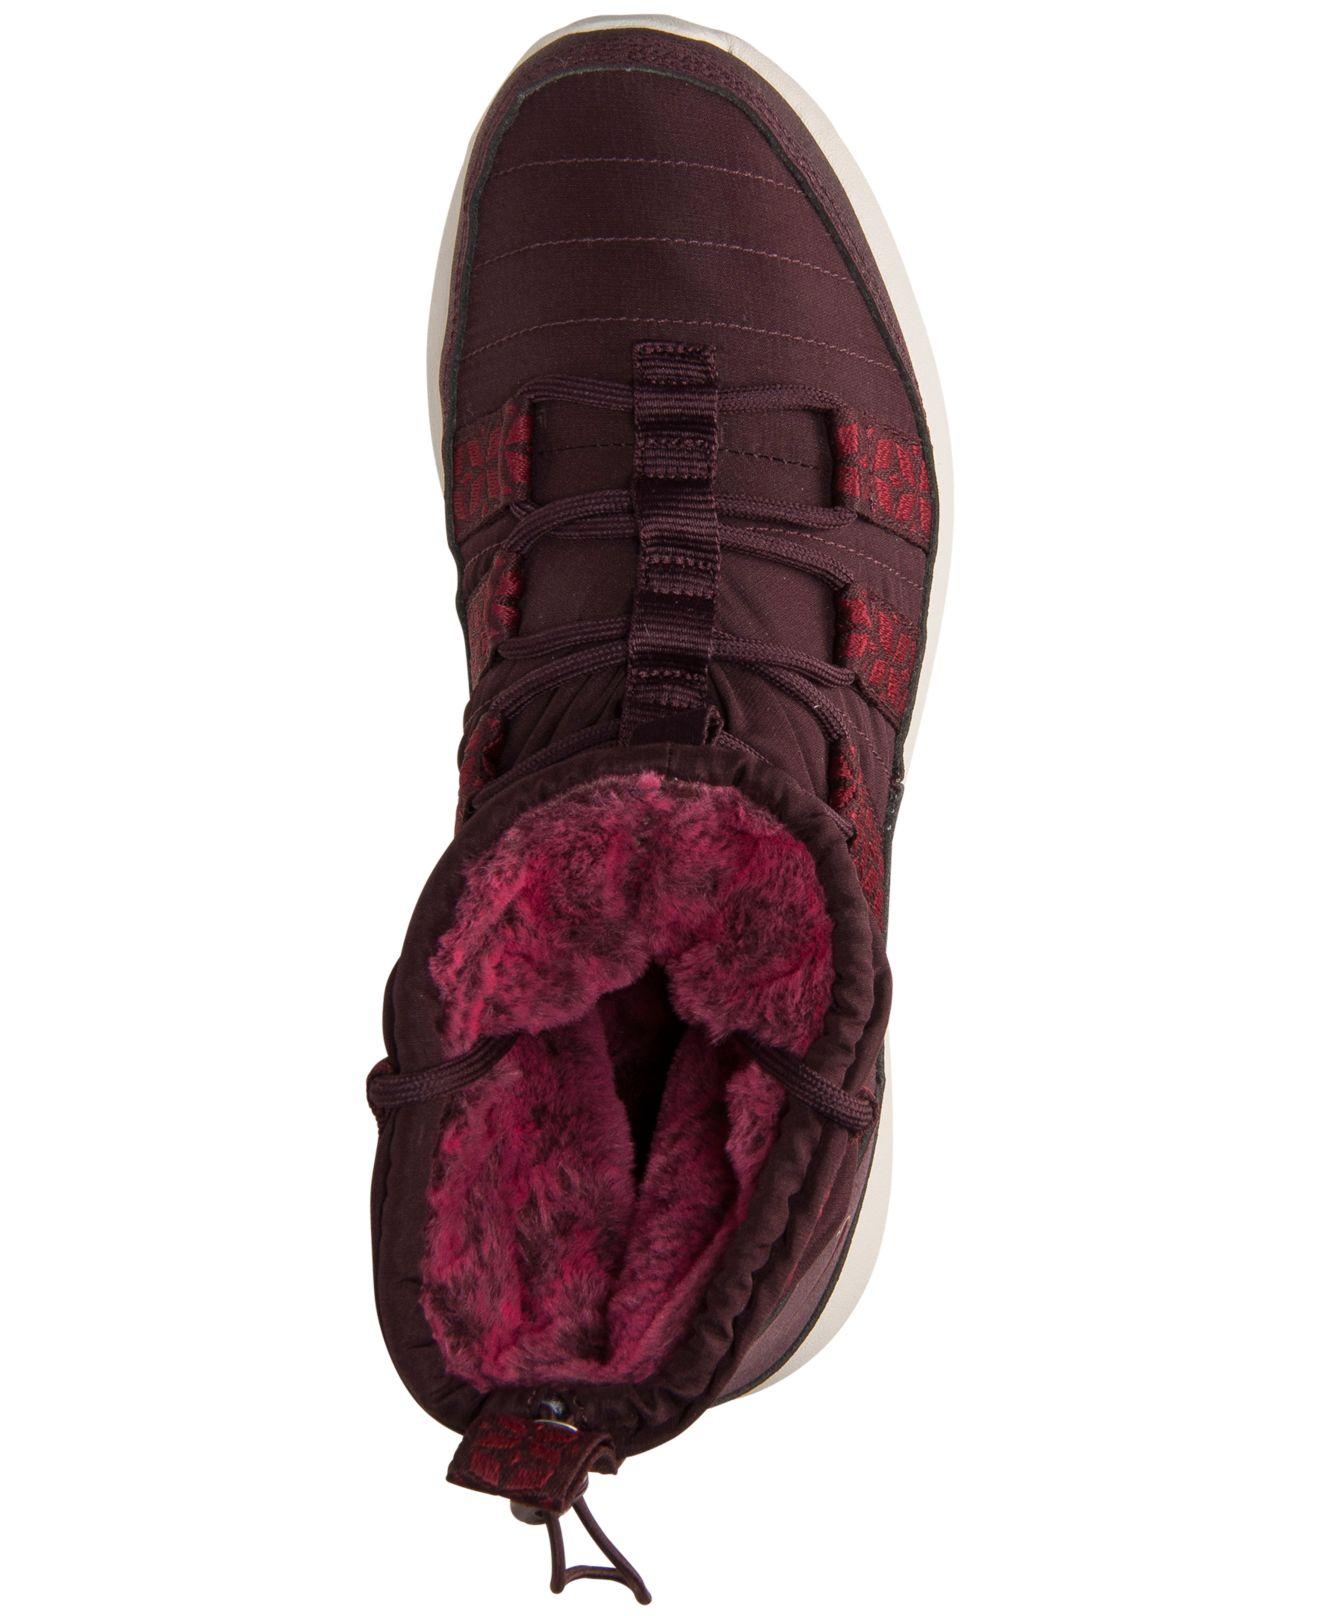 67f79942c1c85 Lyst - Nike Women S Roshe Run Hi Sneakerboots From Finish Line in Purple